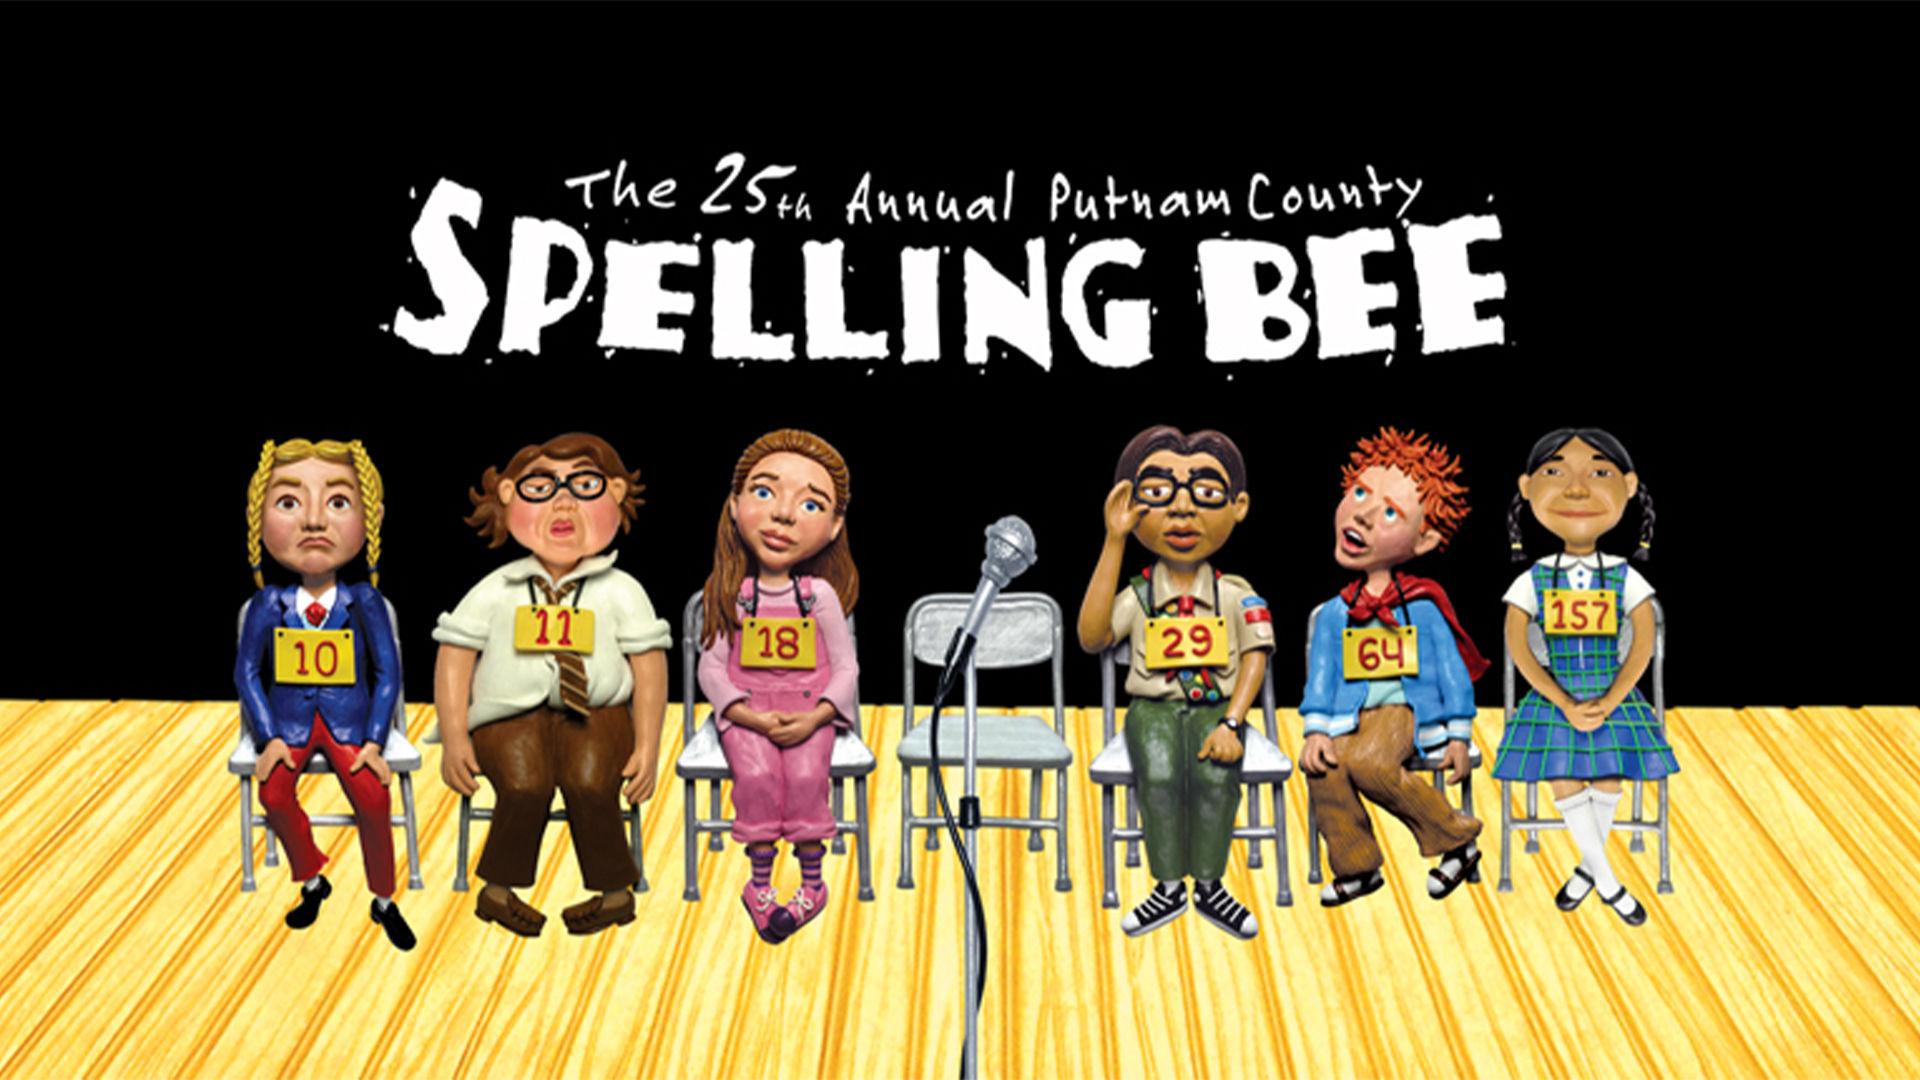 spellin bee cover.jpg